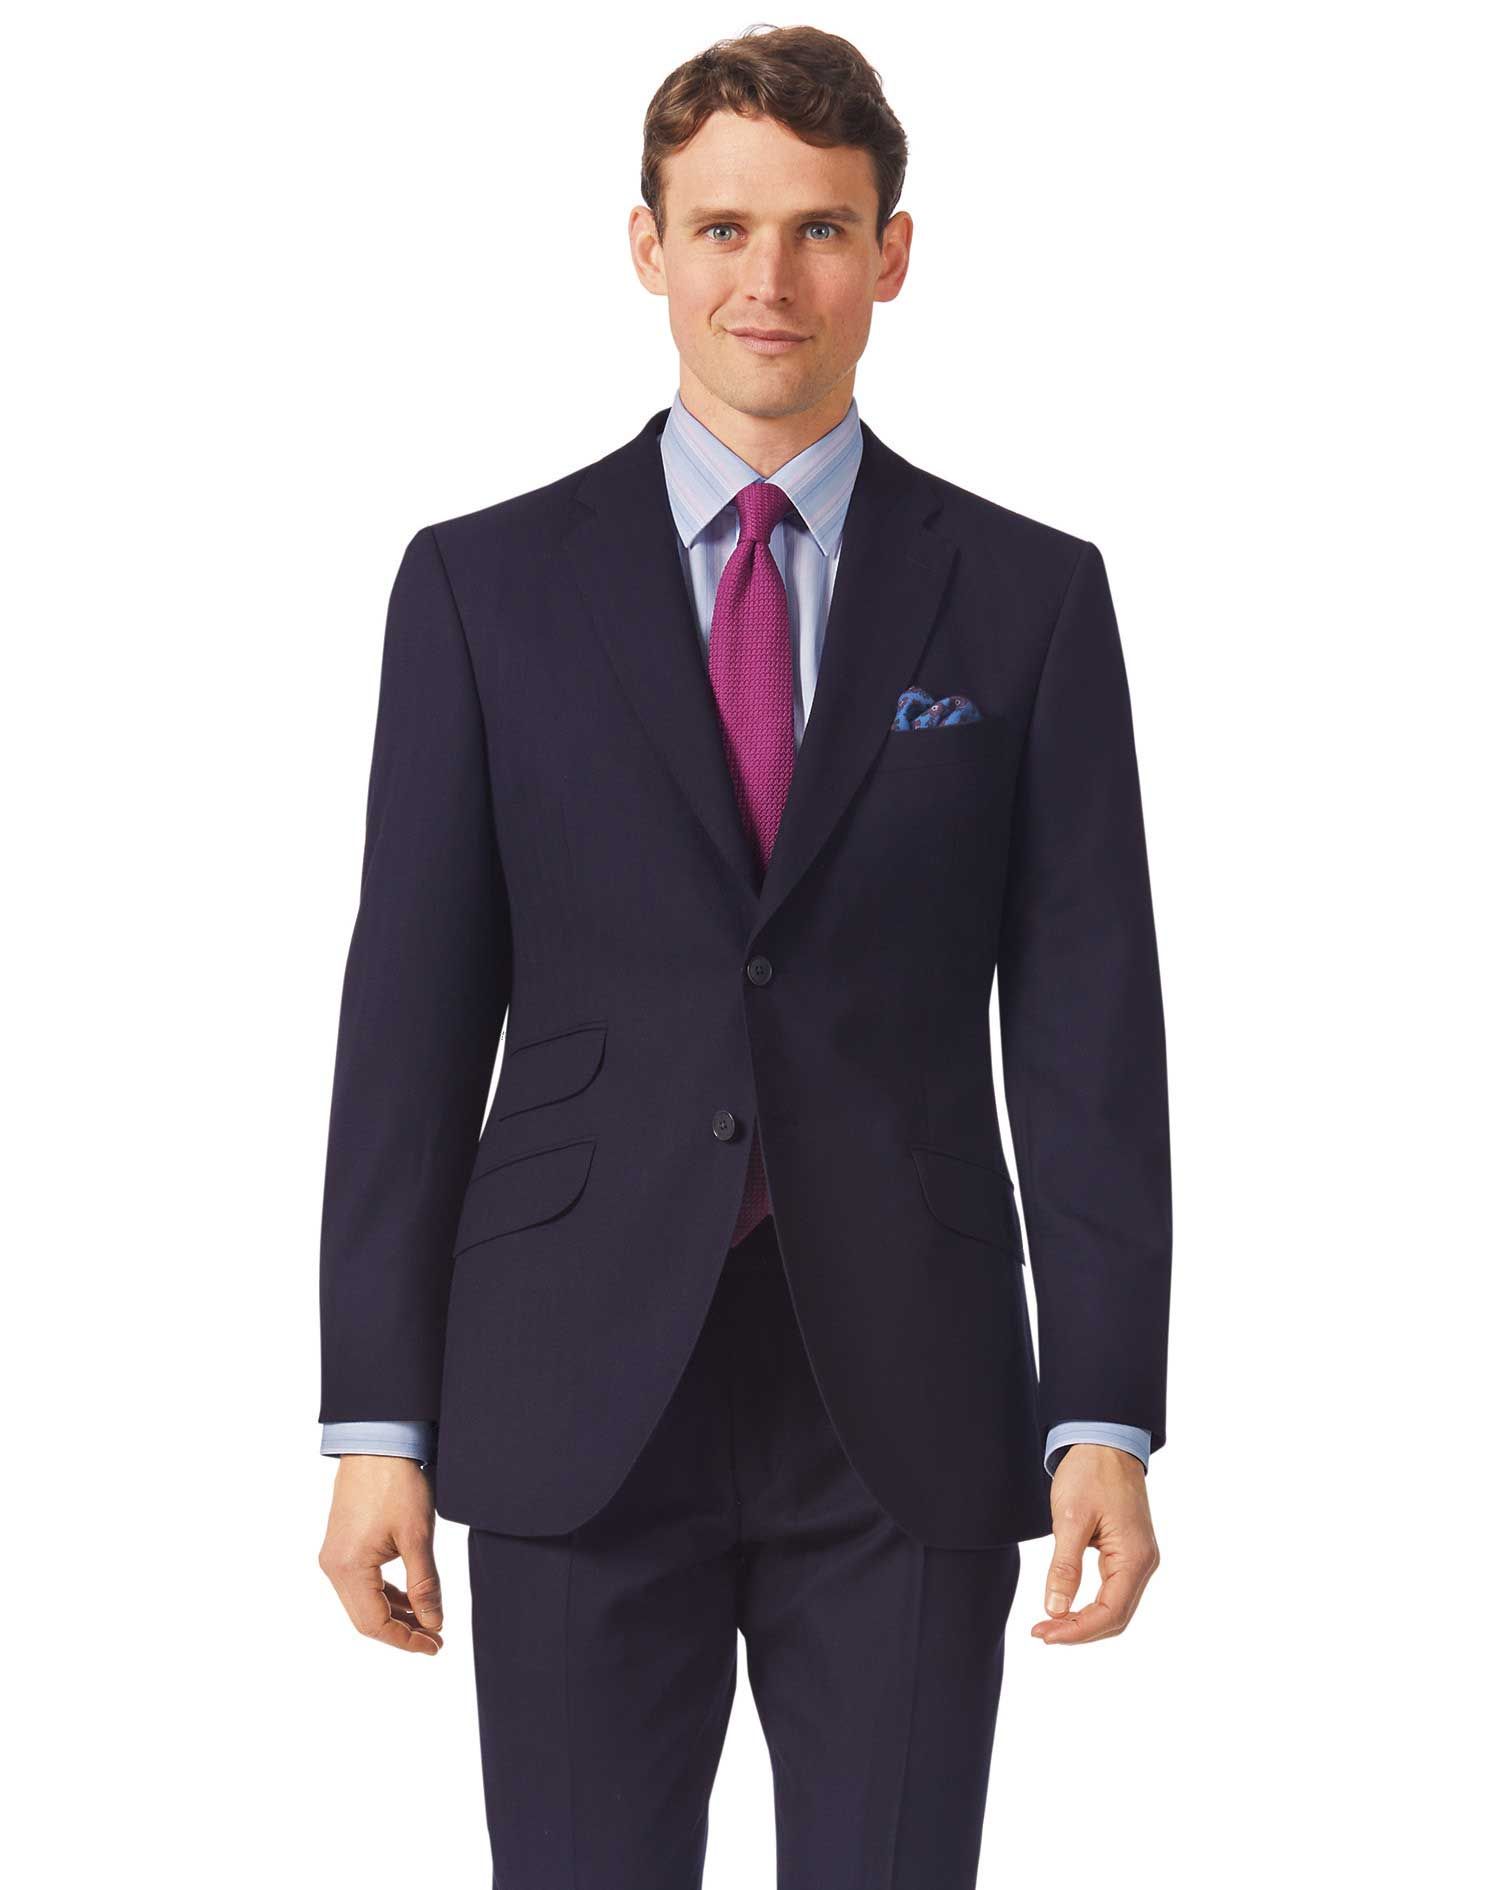 Navy Slim Fit British Luxury Suit Wool Jacket Size 38 Short by Charles Tyrwhitt